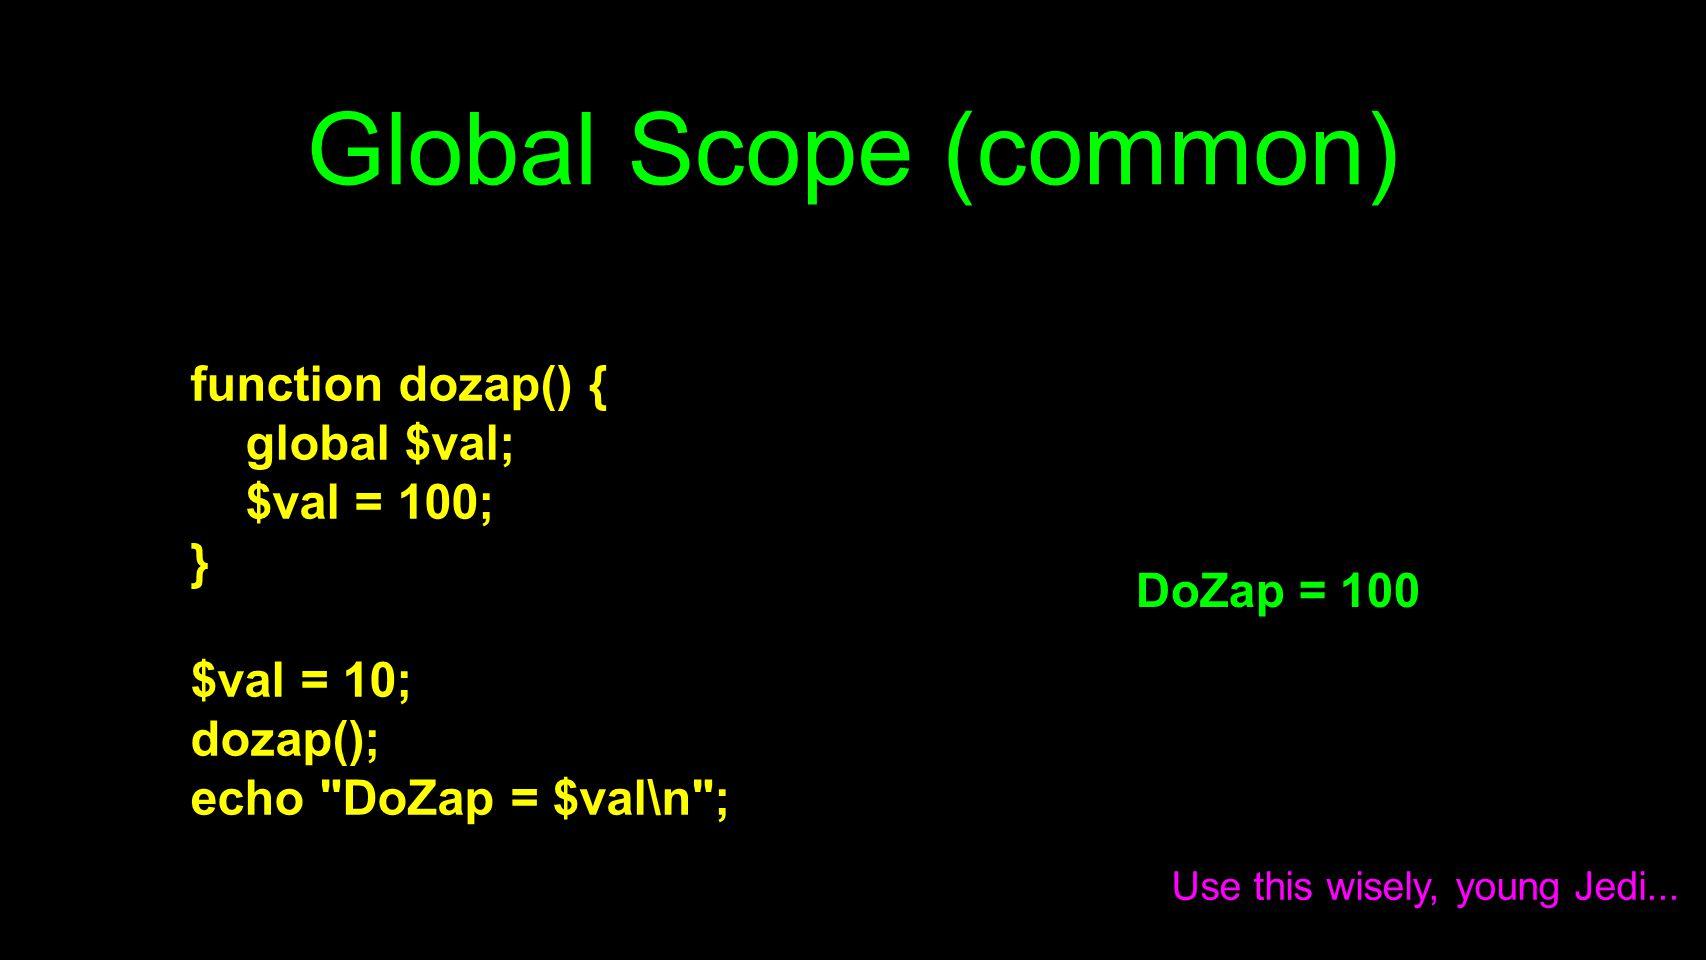 Global Scope (common) function dozap() { global $val; $val = 100; } $val = 10; dozap(); echo